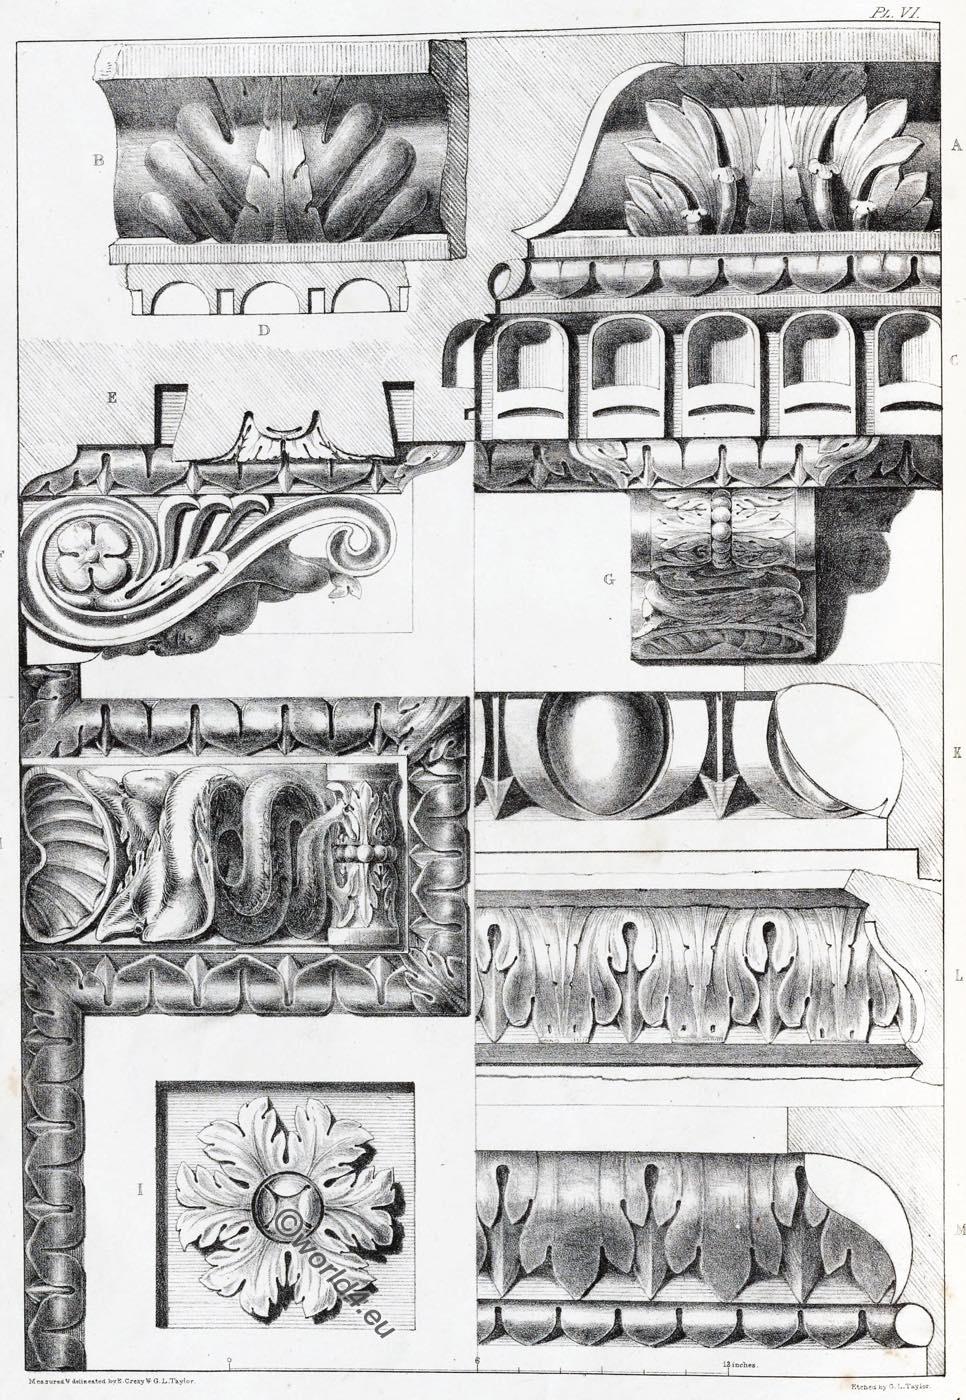 Arch, Titus, Entablature, Rome, Capital, Ornament, Decoration, Architecture, antiquities,